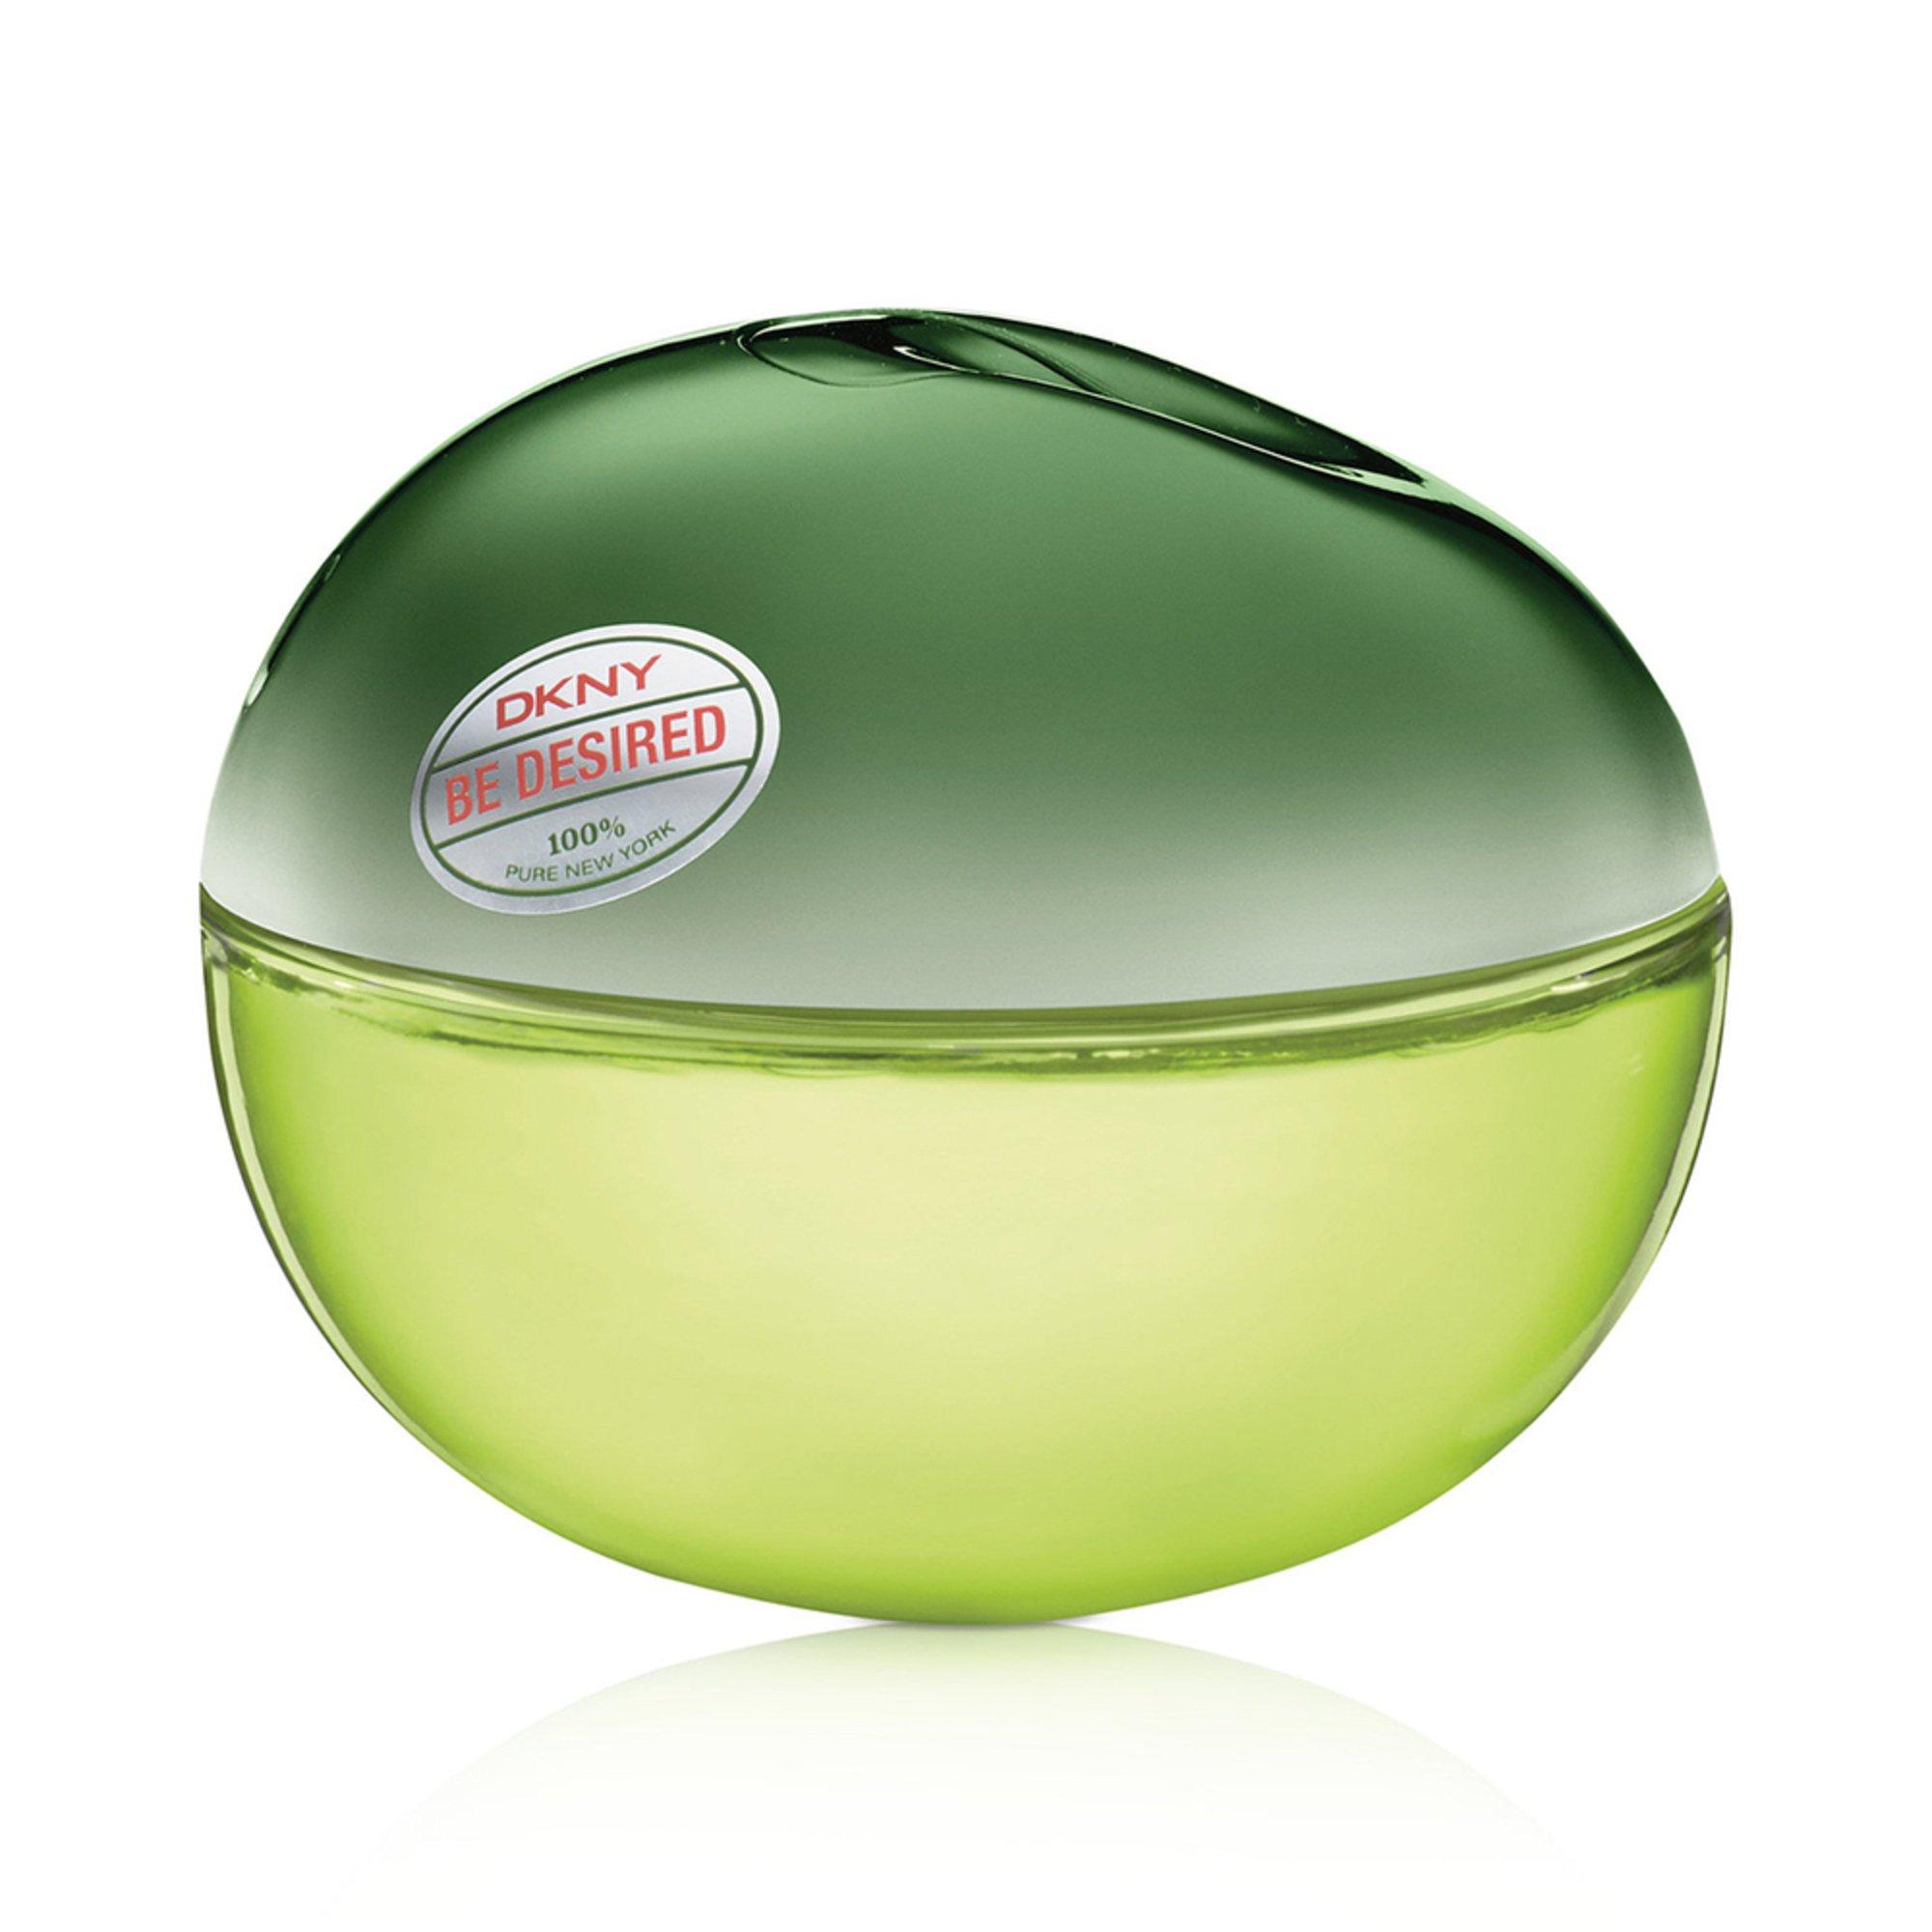 Dkny Be Desired Eau De Parfum 34oz Perfume Health Beauty